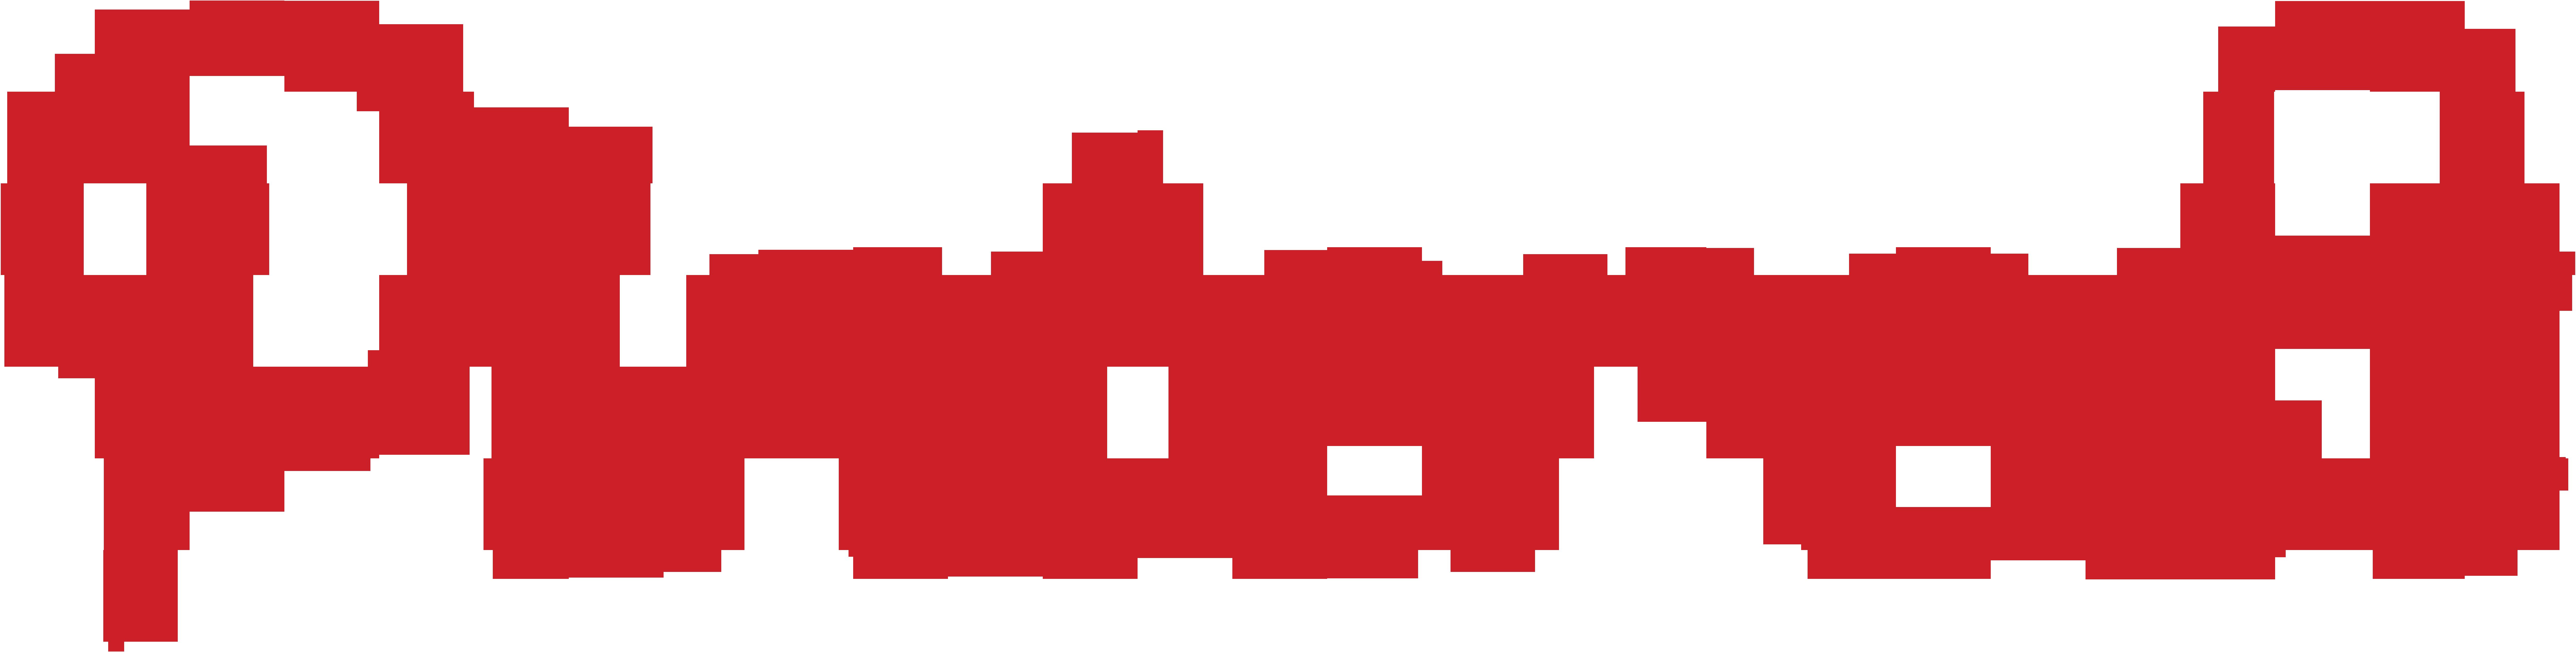 logo, pinterest text png #2011